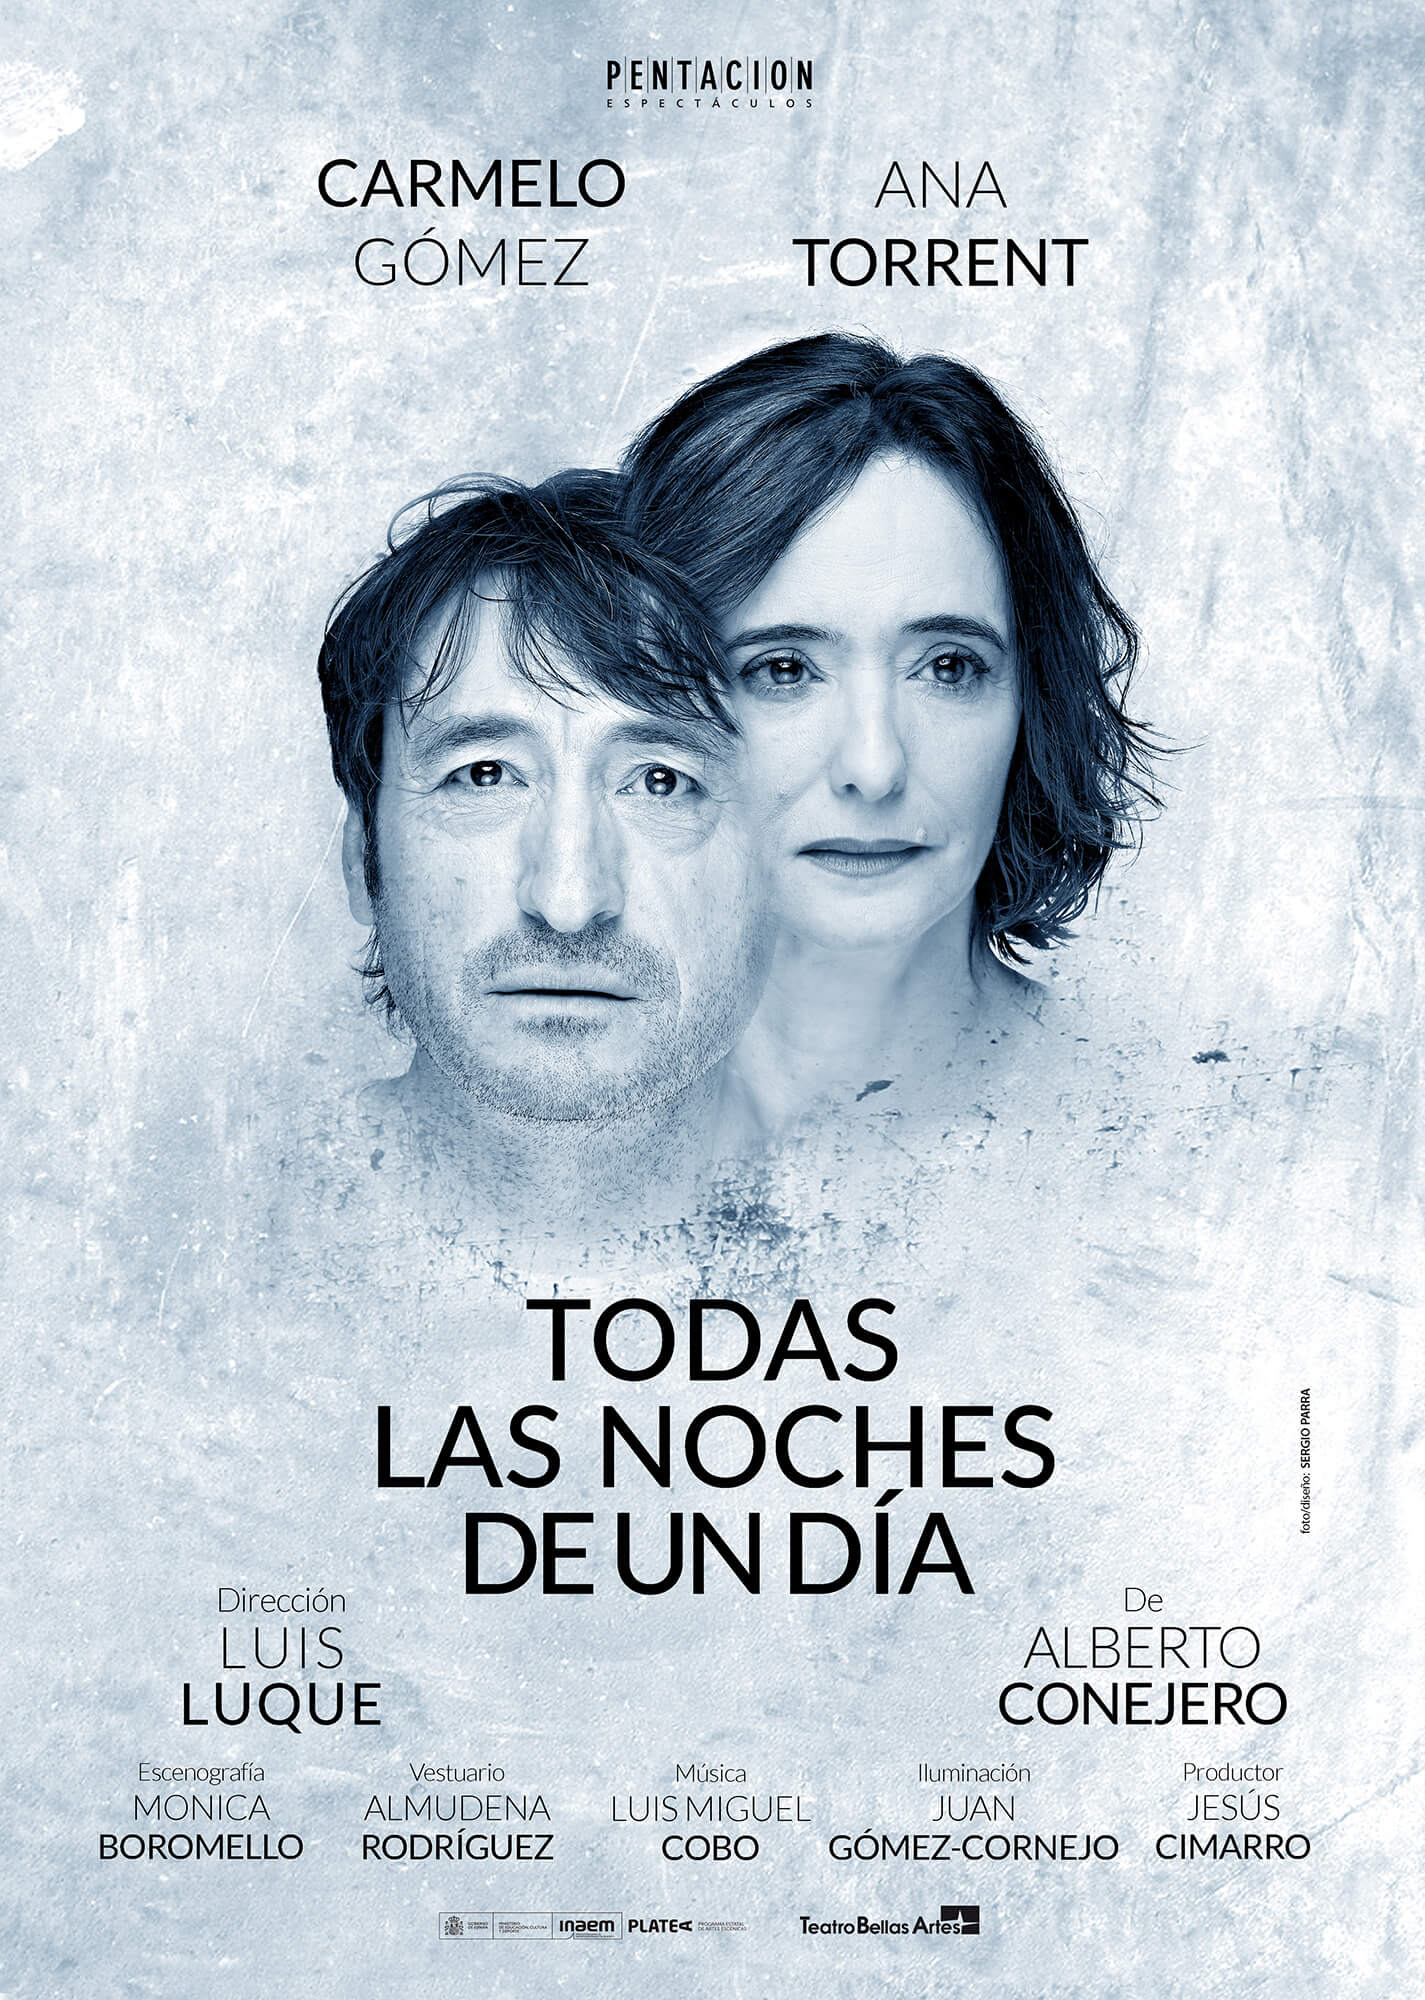 Gira de Todas las noches de un día - Teatro - Carmelo Gómez